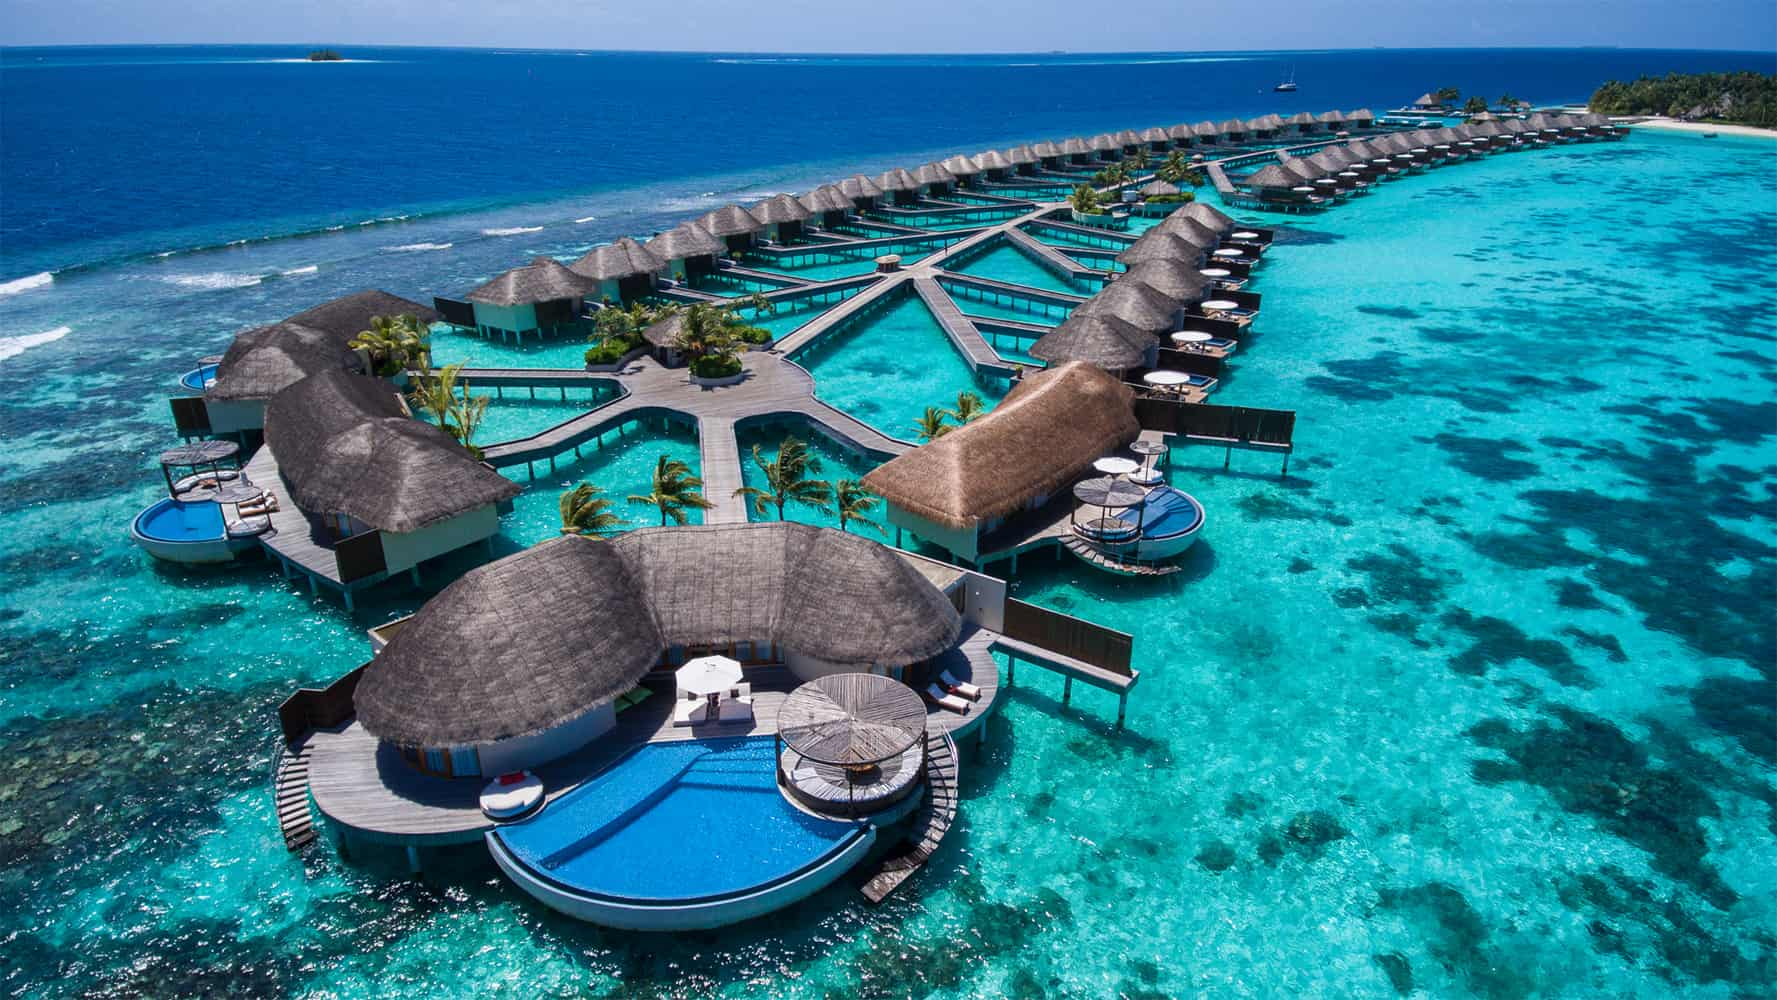 Os 6 Melhores Resorts do Caribe